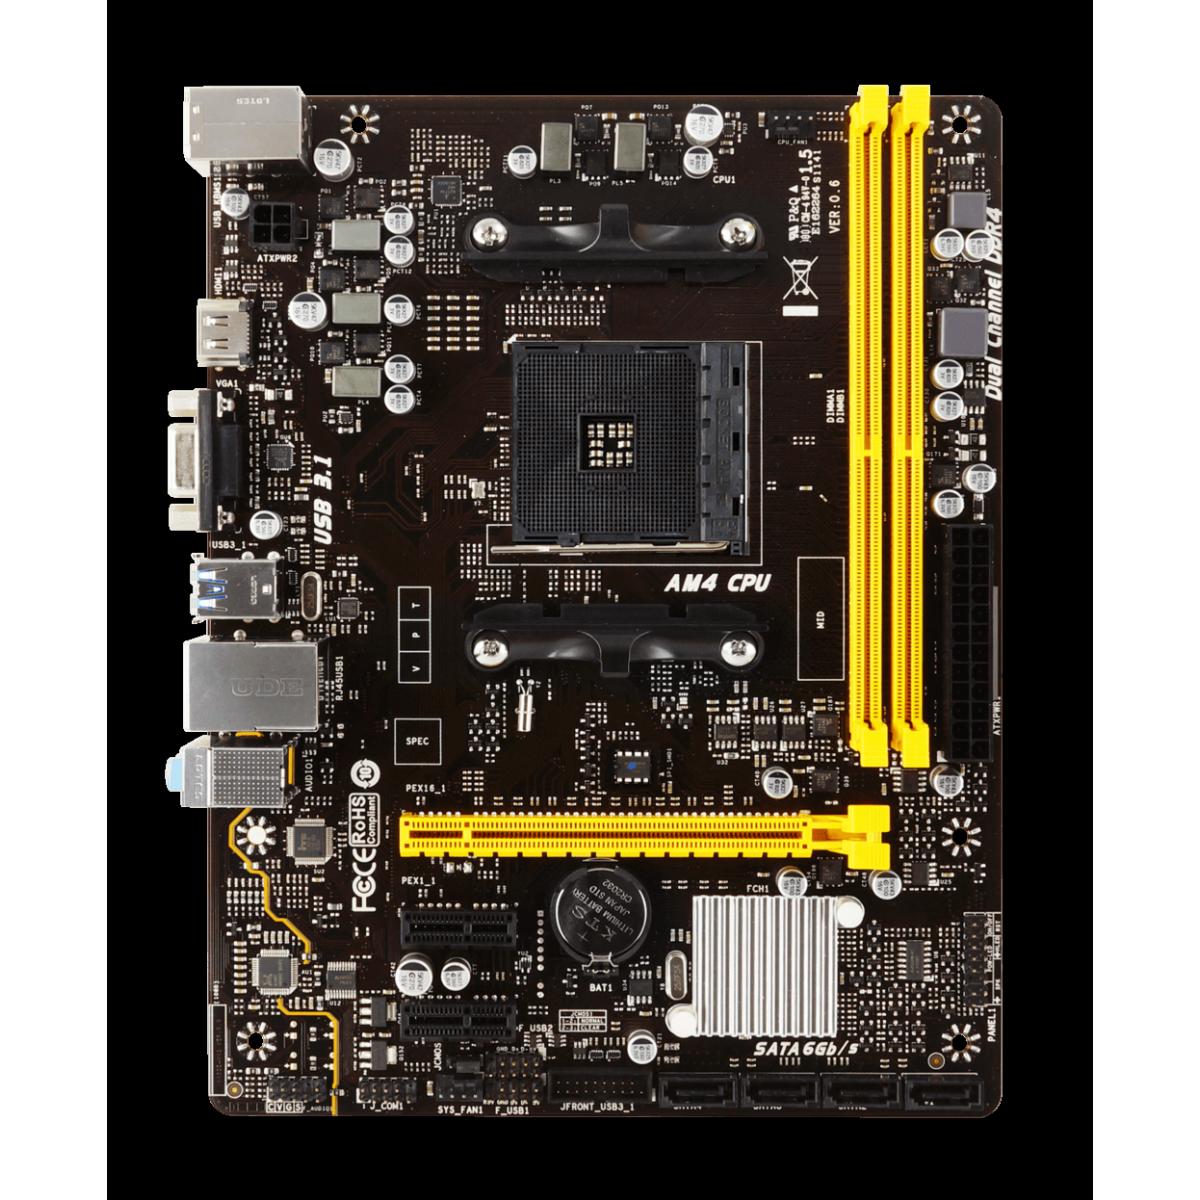 Kit Upgrade Biostar GeForce GT 610 + AMD Ryzen 5 3500 + Biostar A320MH + Memória DDR4 16GB (2x8GB) 3000Mhz